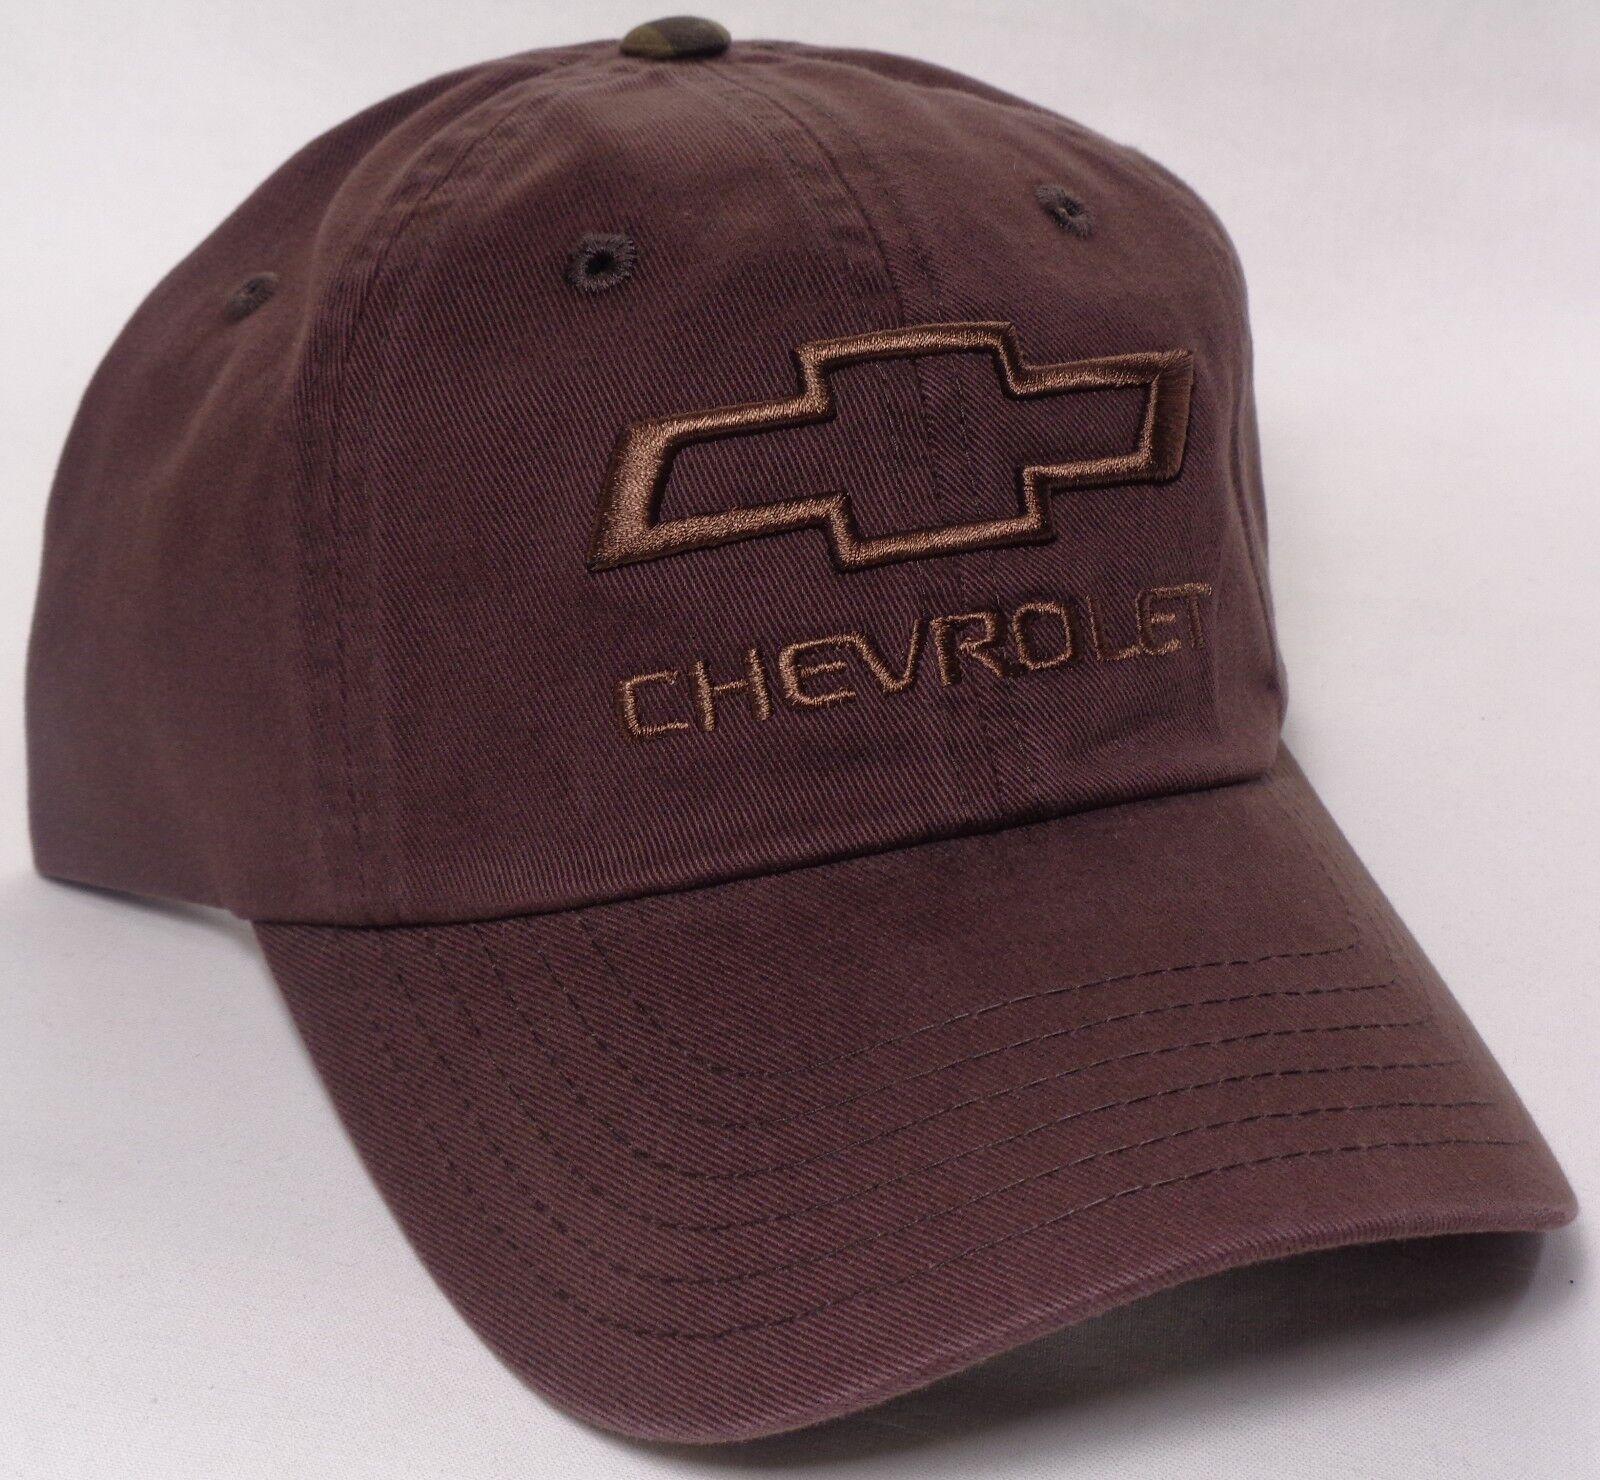 Hat Cap Chevrolet Chevy Brown Bowtie Camo Army Brown Chevy CF ba05d2